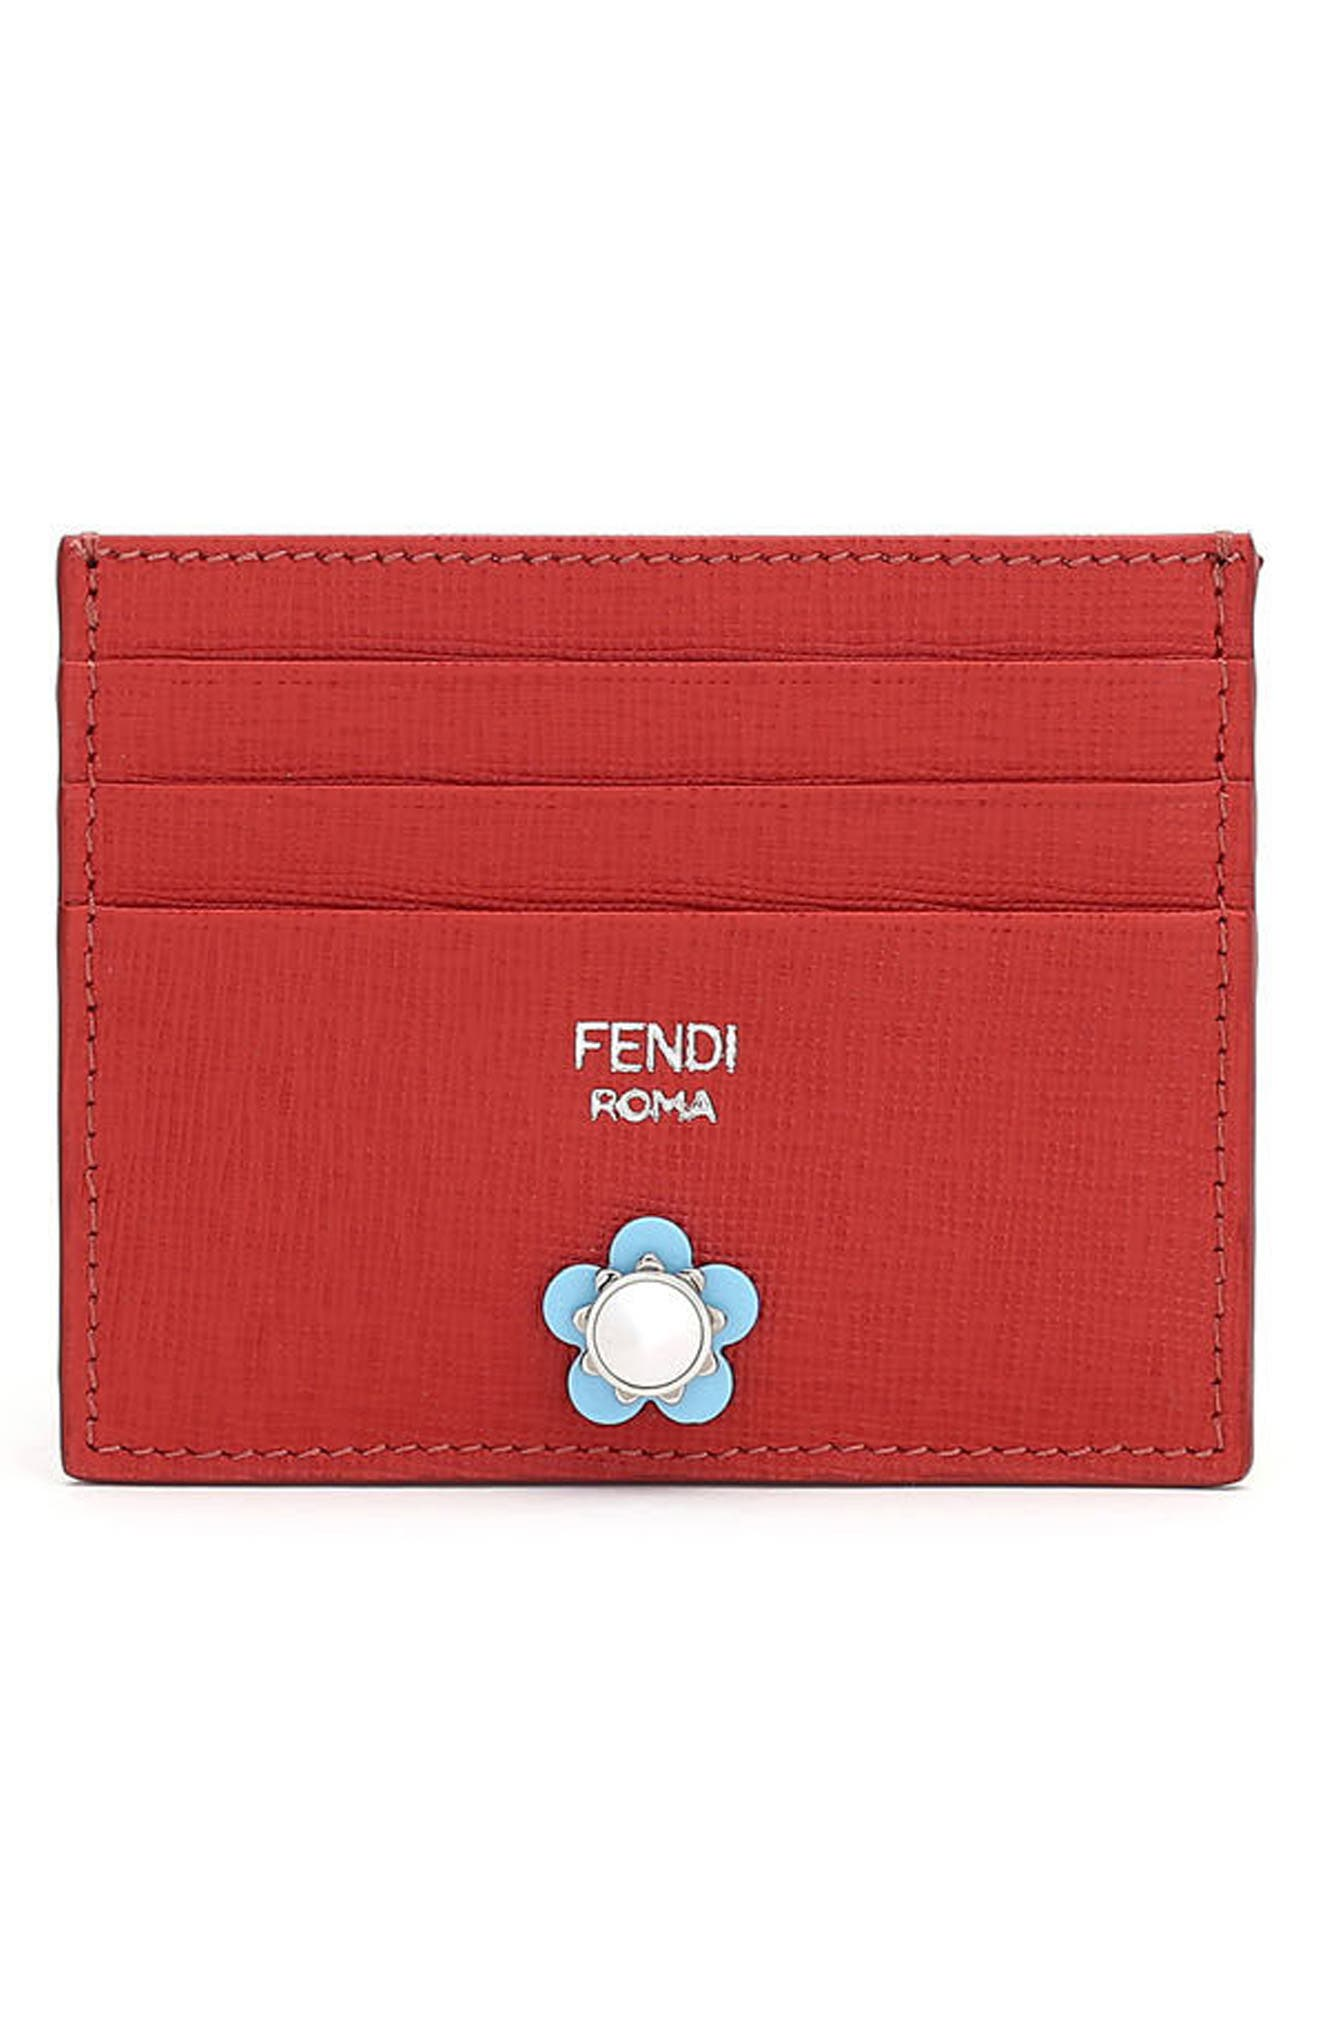 Alternate Image 1 Selected - Fendi Flowerland Elite Leather Card Case